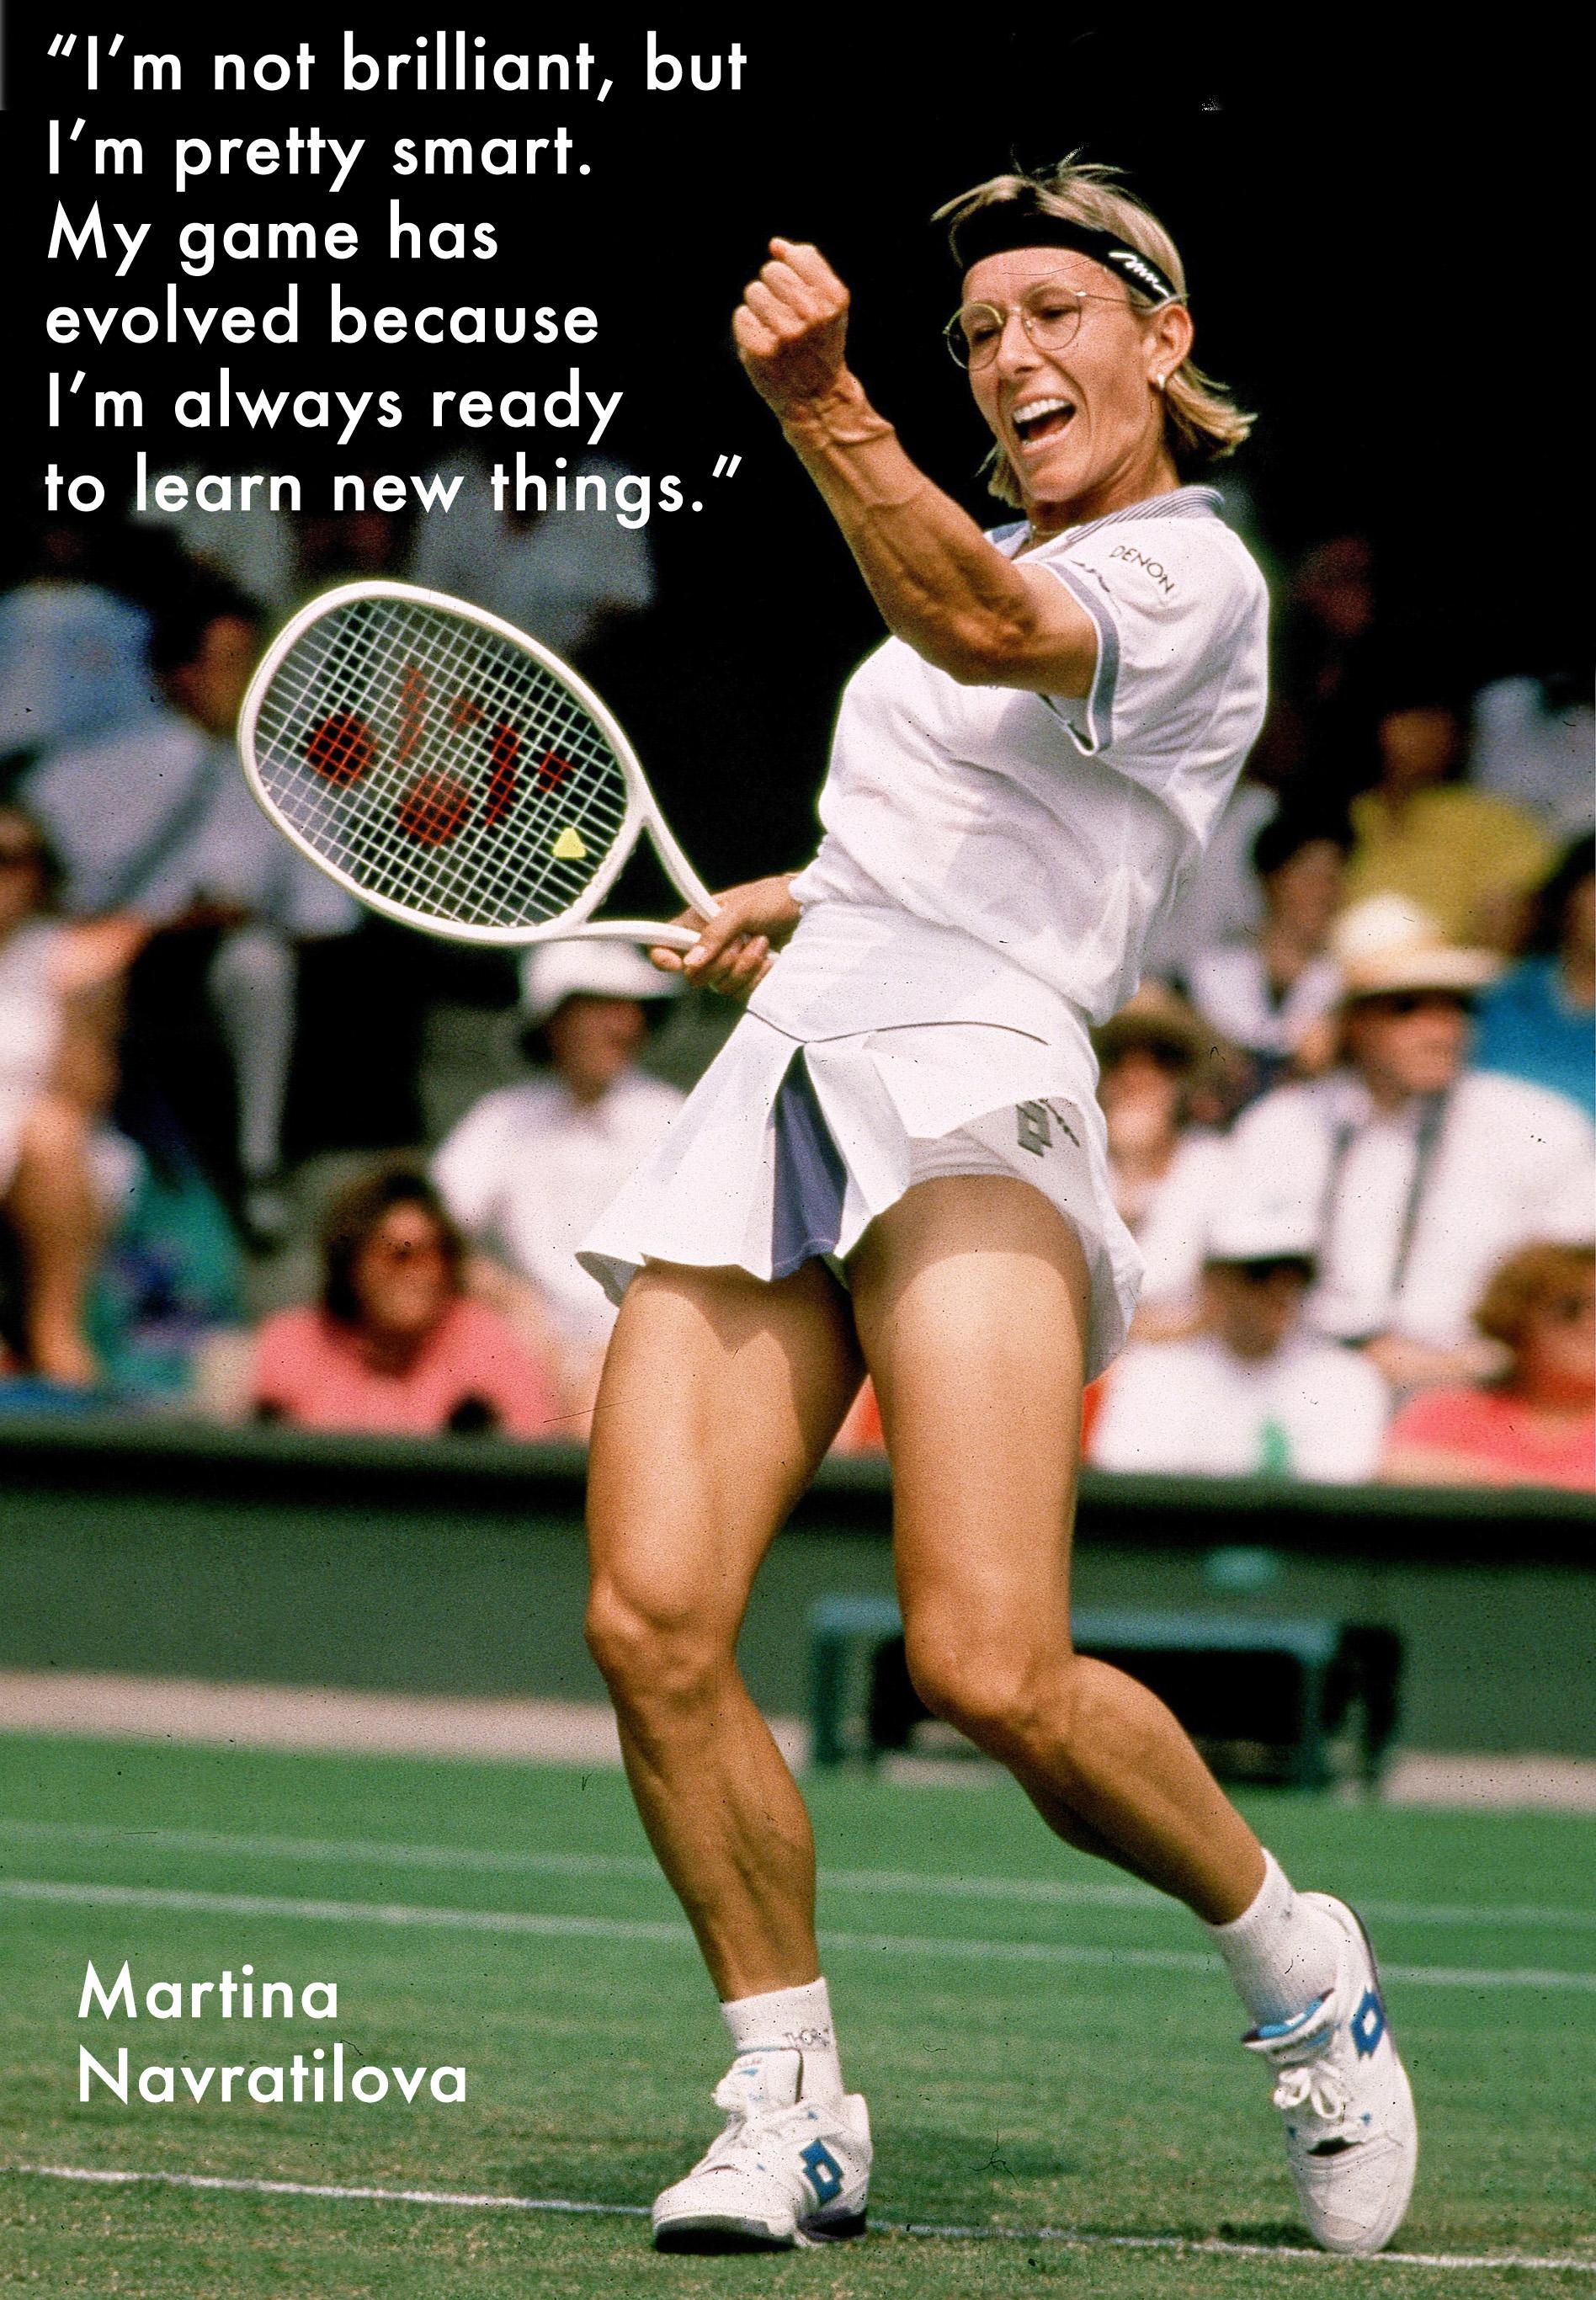 Martina Navratilova's quote #5